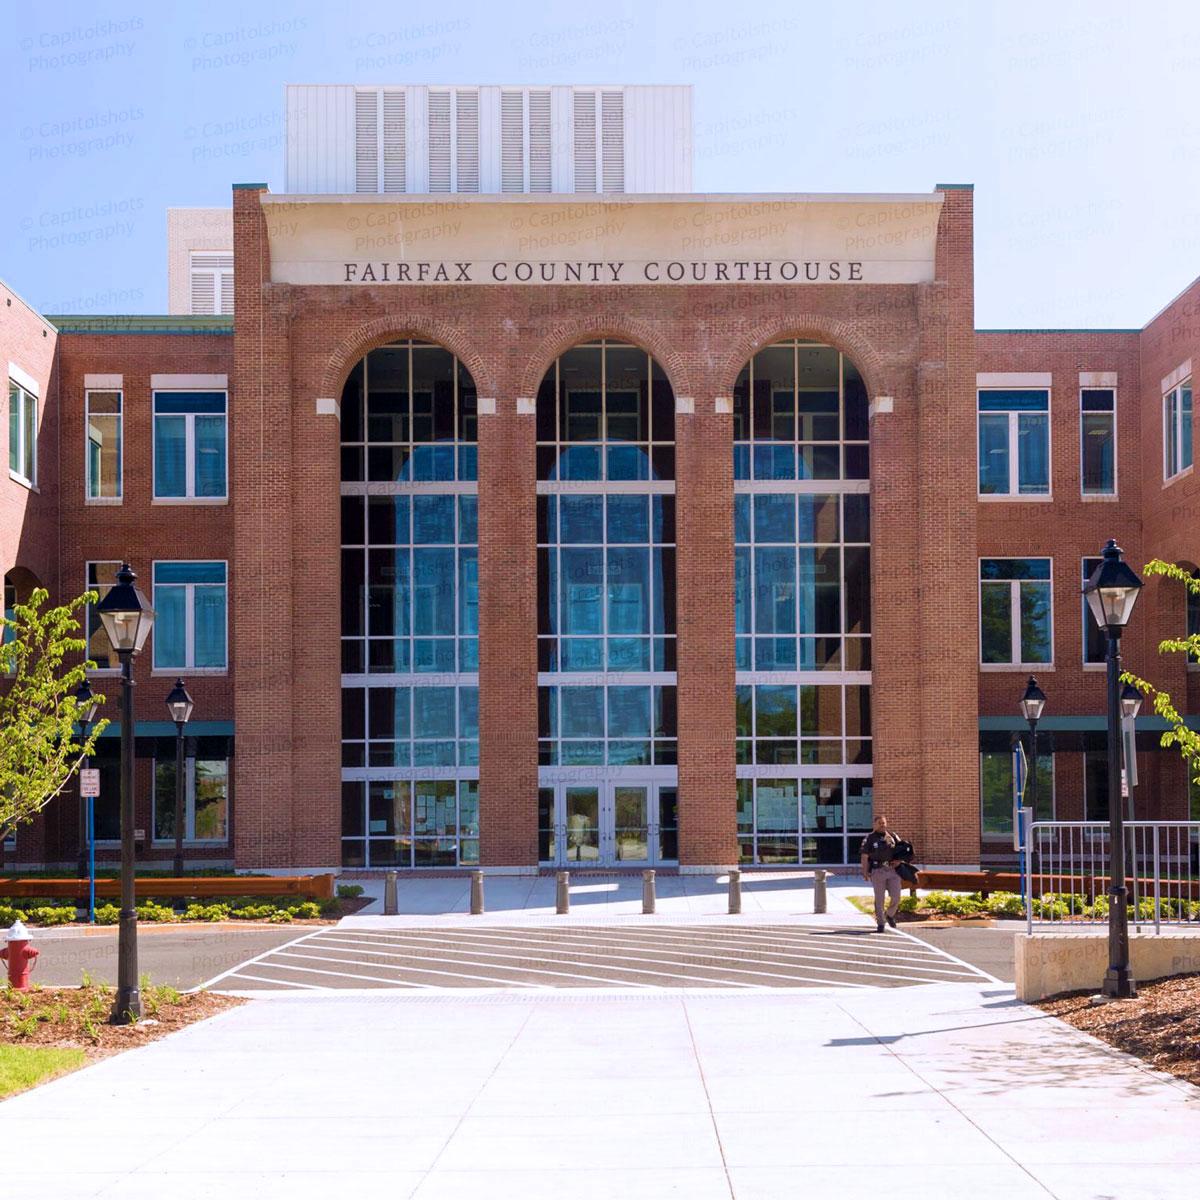 Fairfax County Courthouse -  Fairfax,  VA